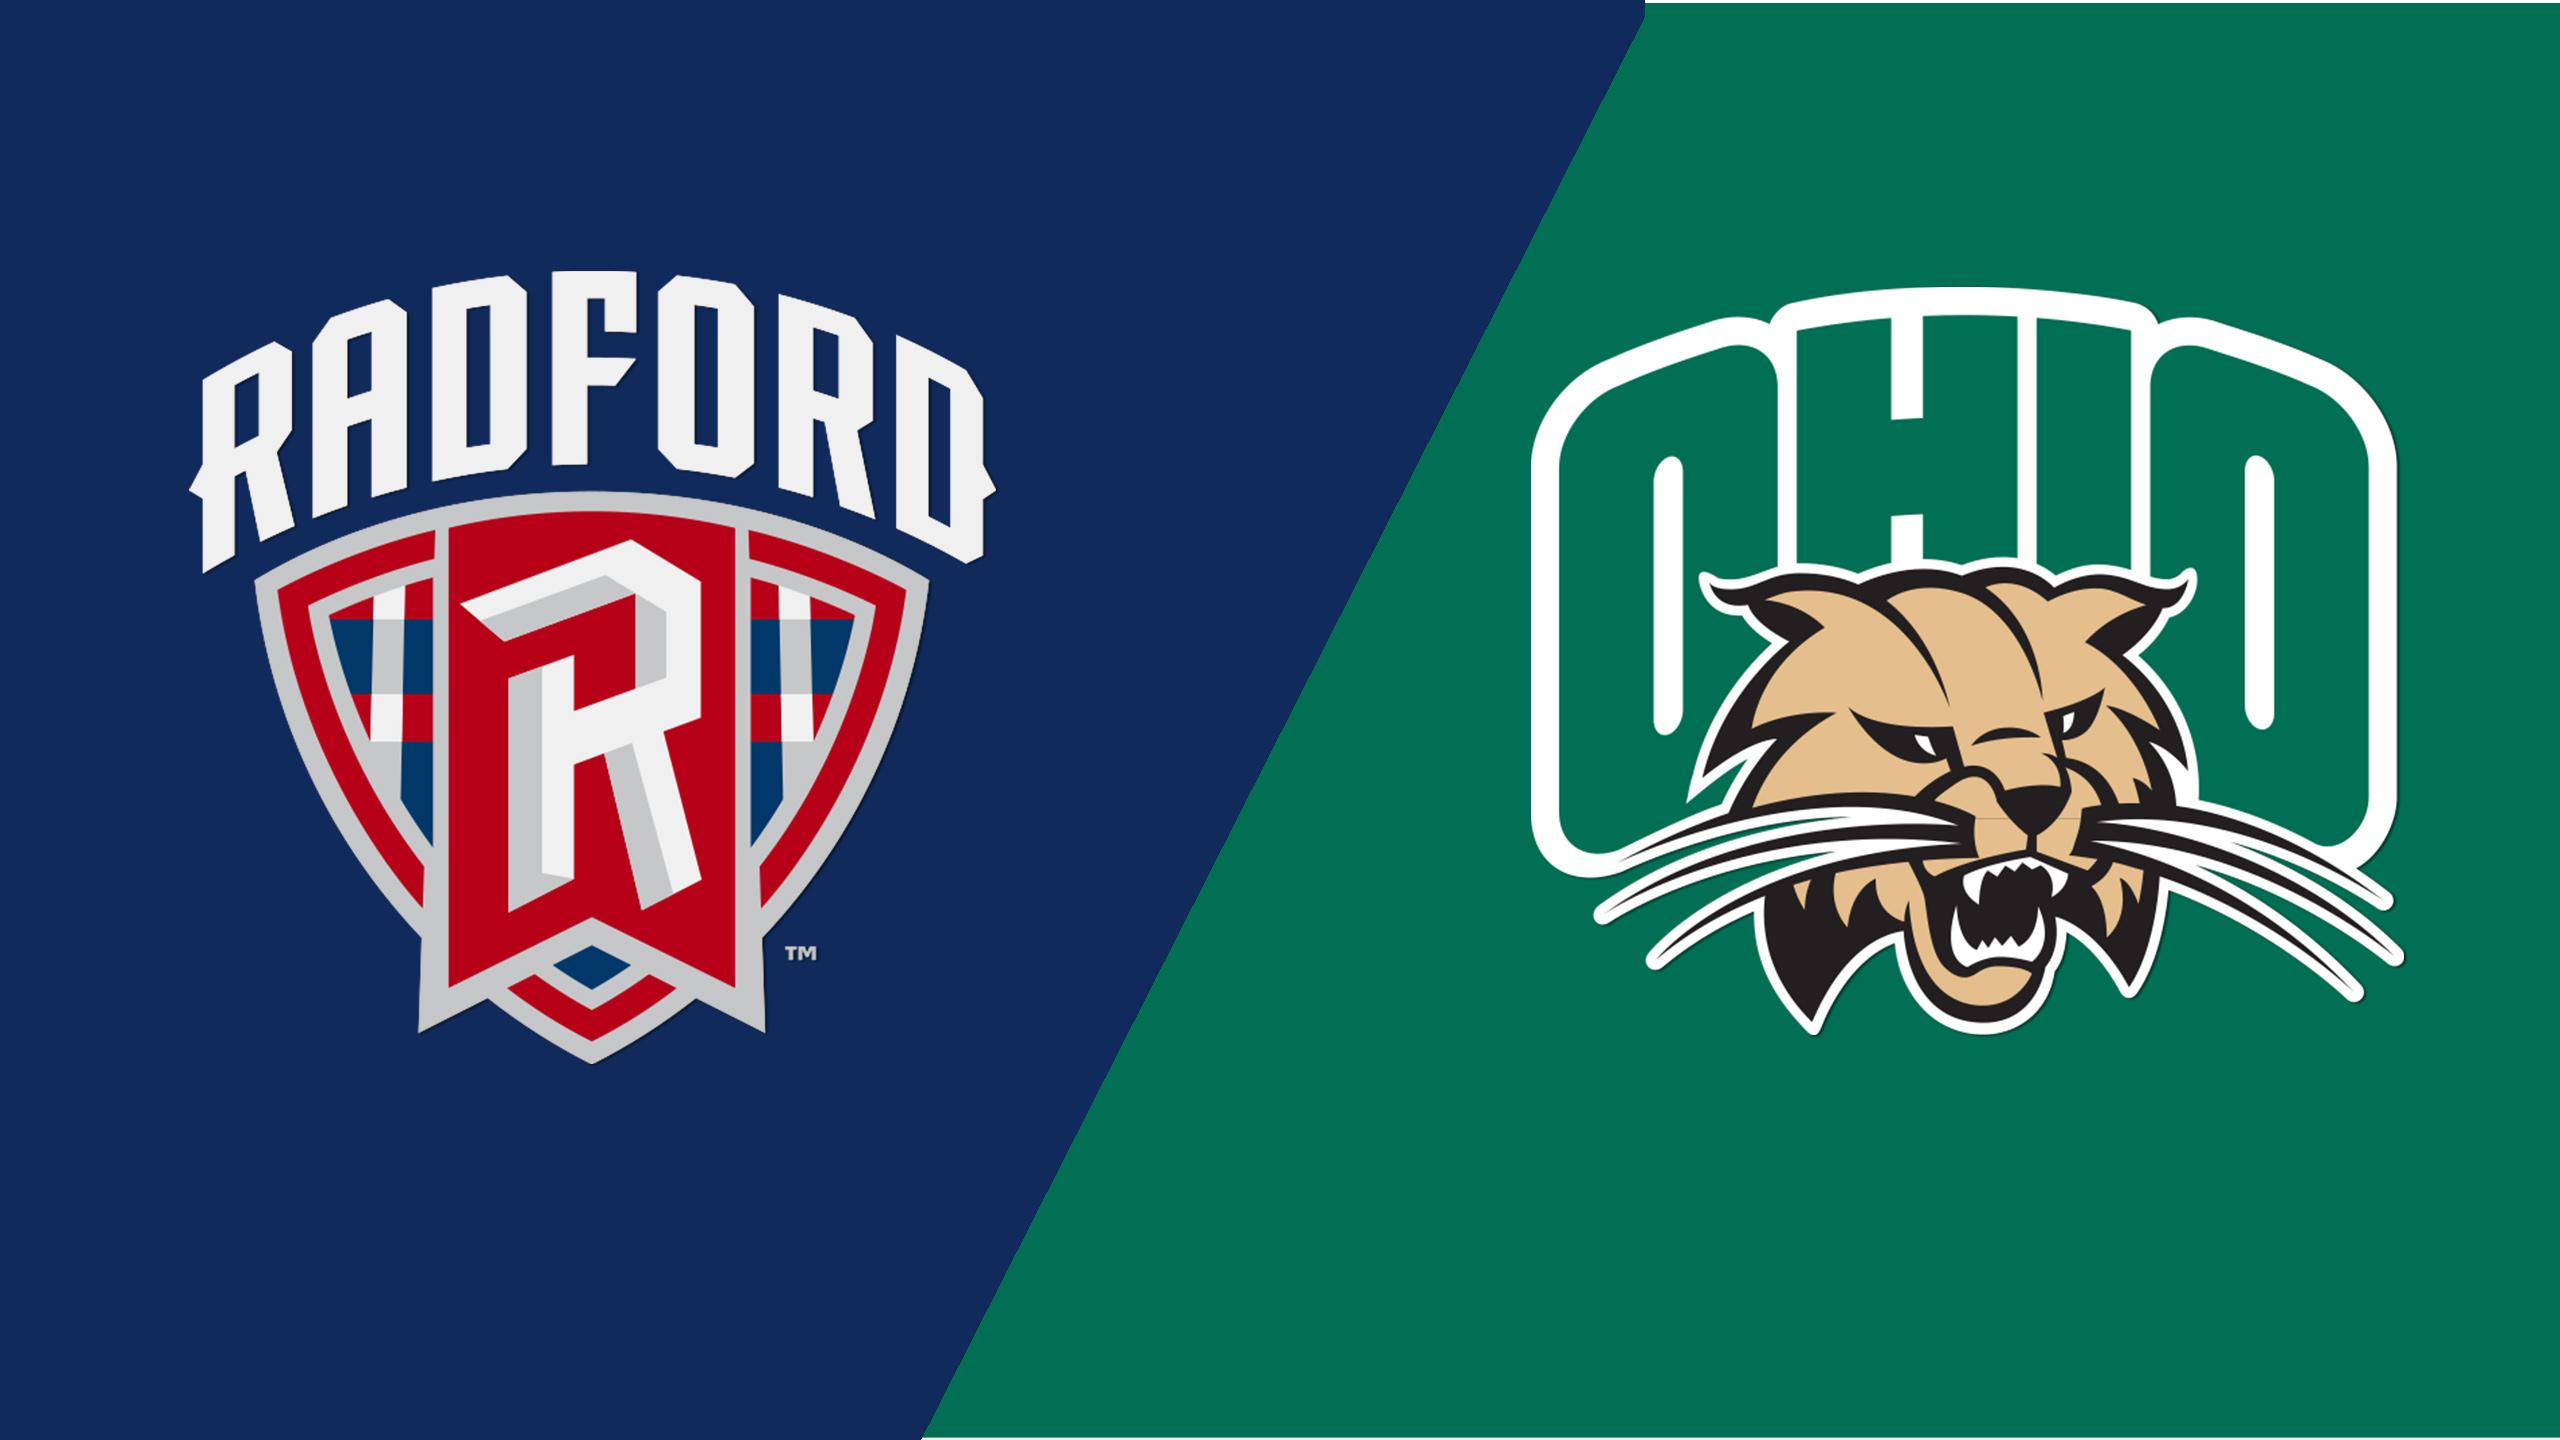 Radford vs. Ohio (M Basketball)